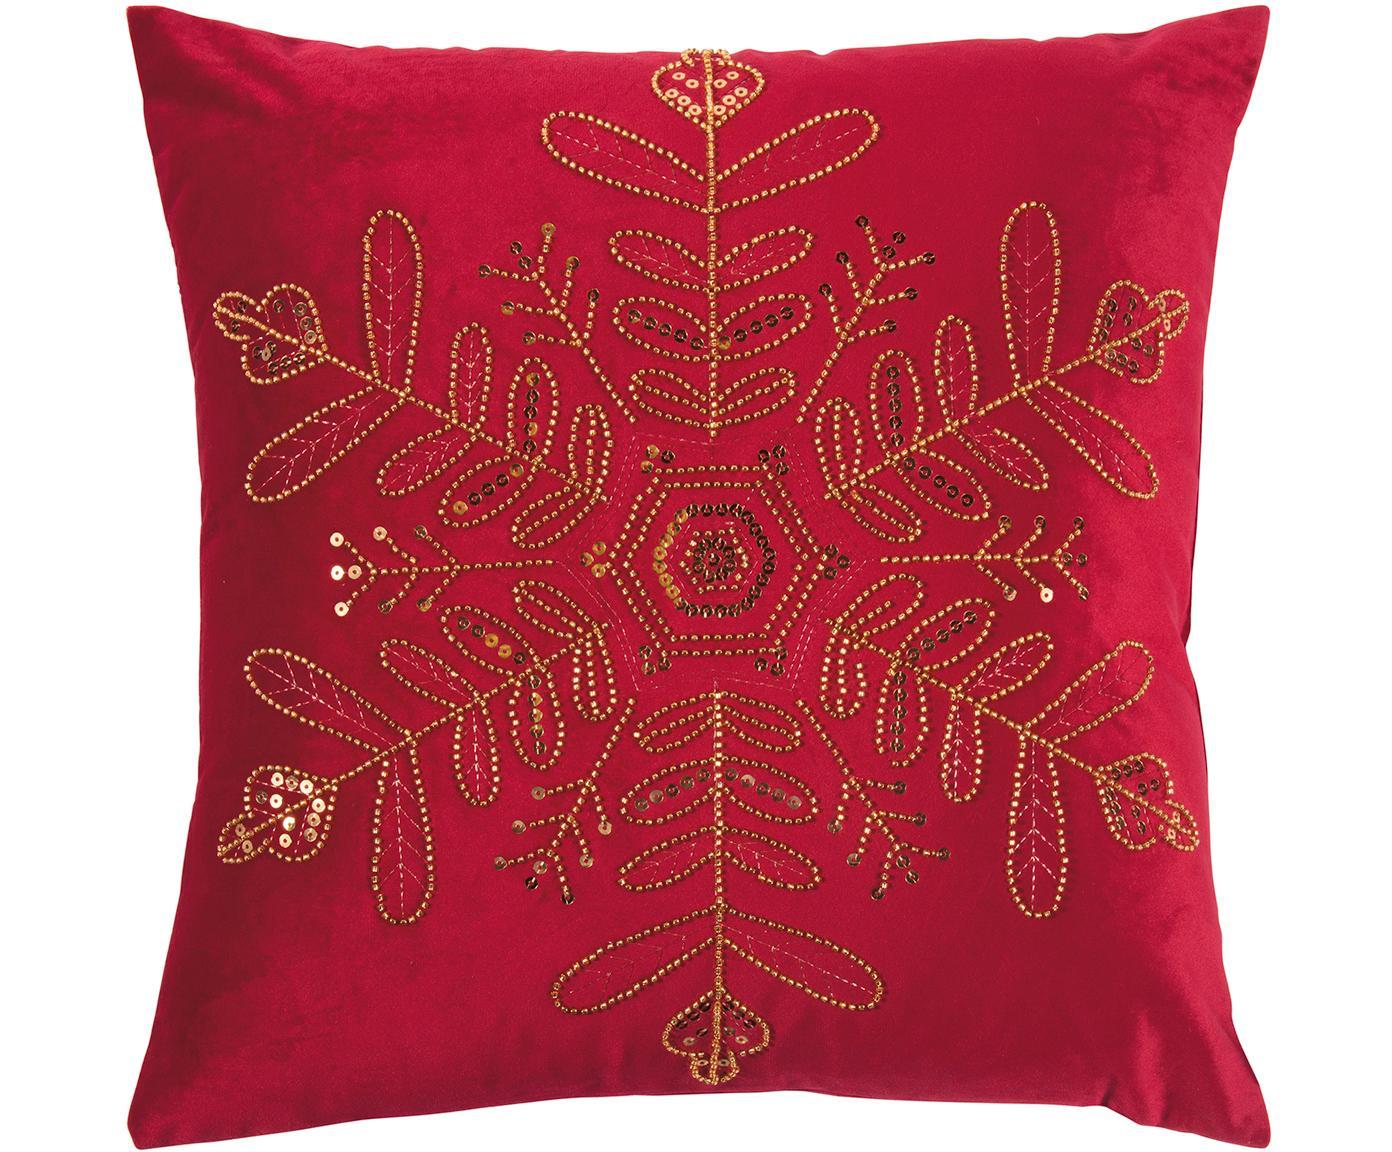 Fluwelen kussenhoes Sparkle, Polyester fluweel, Rood, goudkleurig, 45 x 45 cm